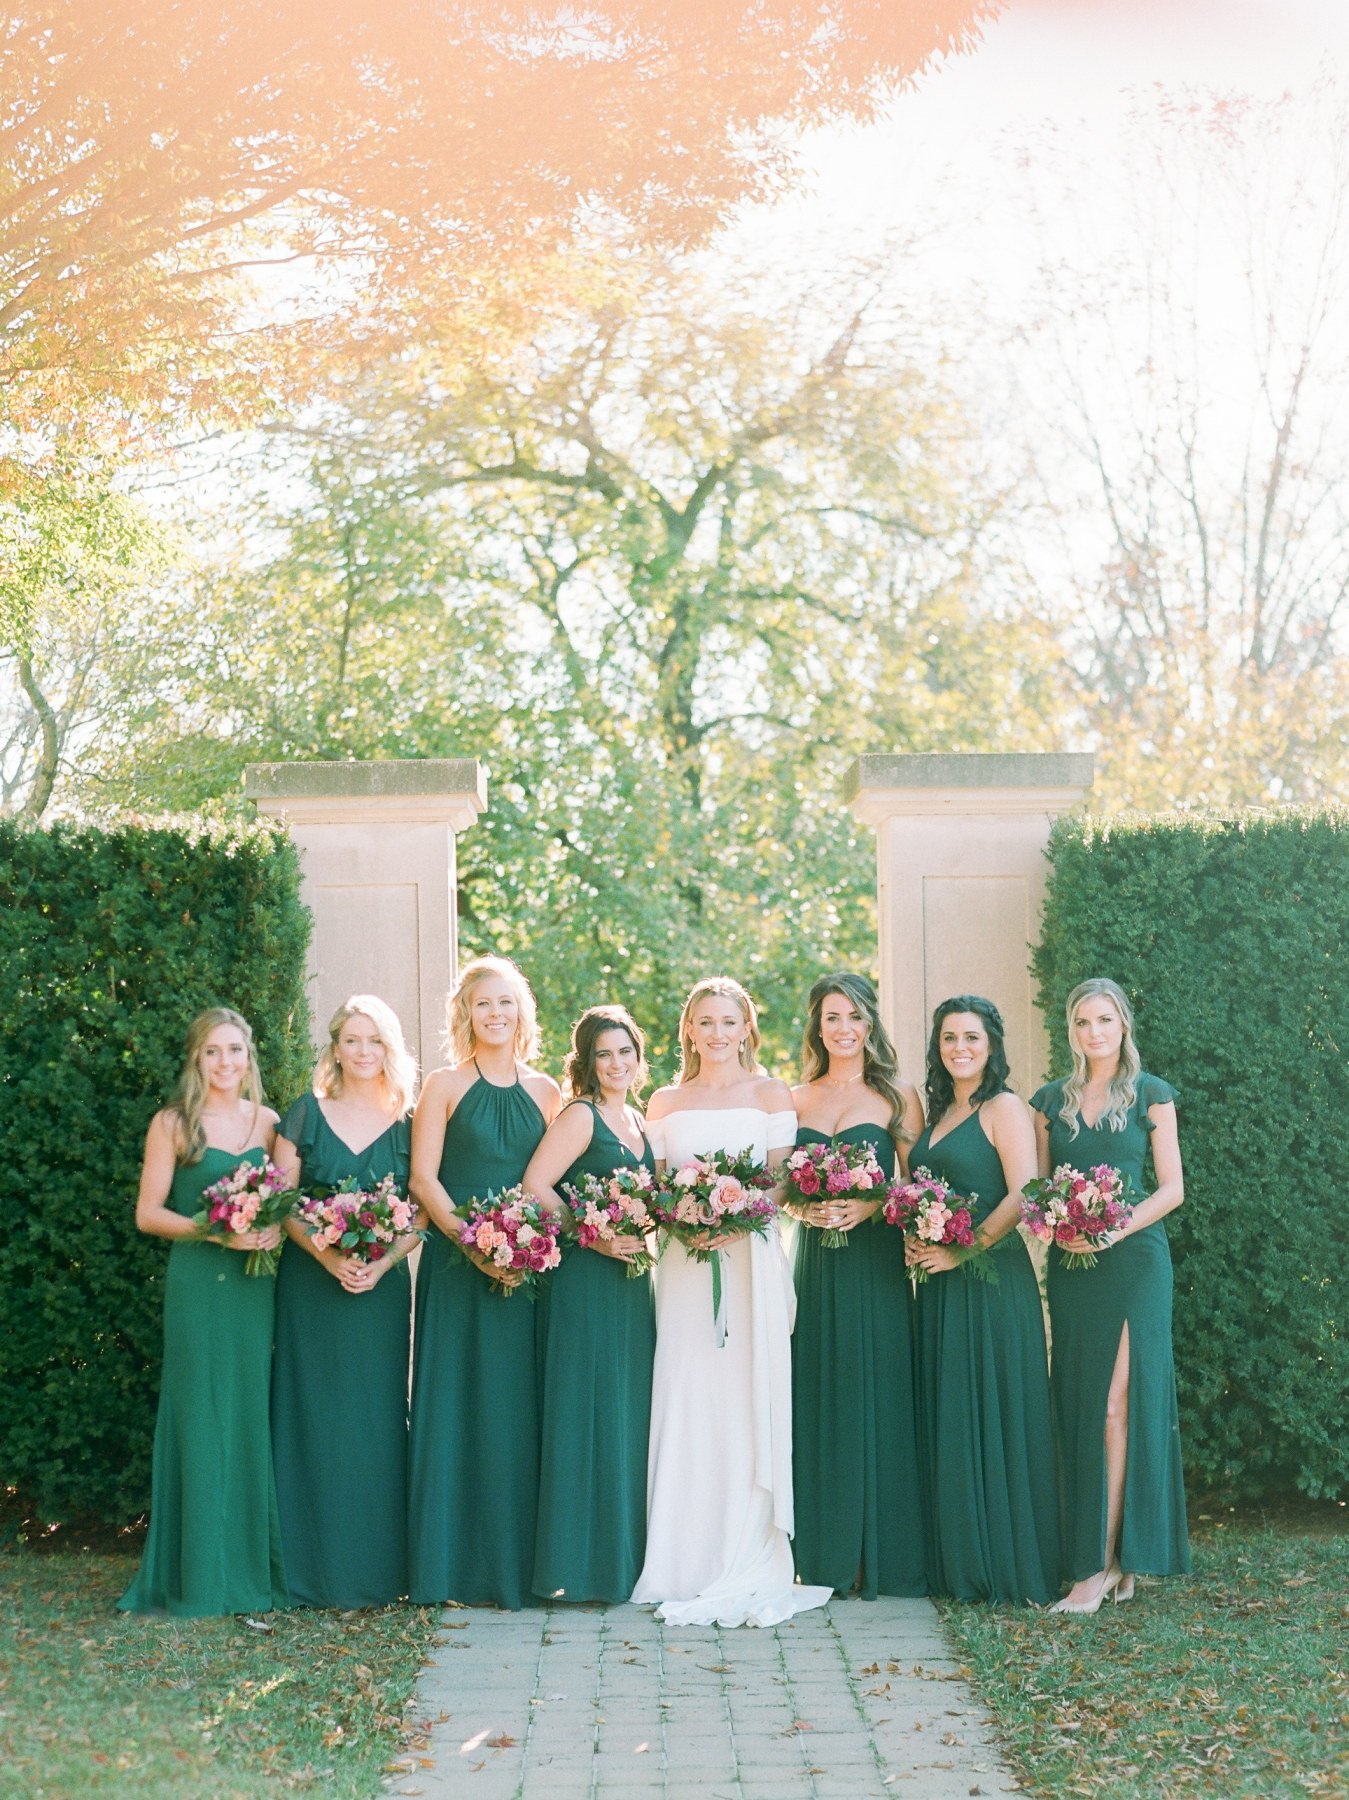 33Great_Marsh_Estates_Wedding_Anne_Kelley_Events_Astrid_Photography146486010009-2